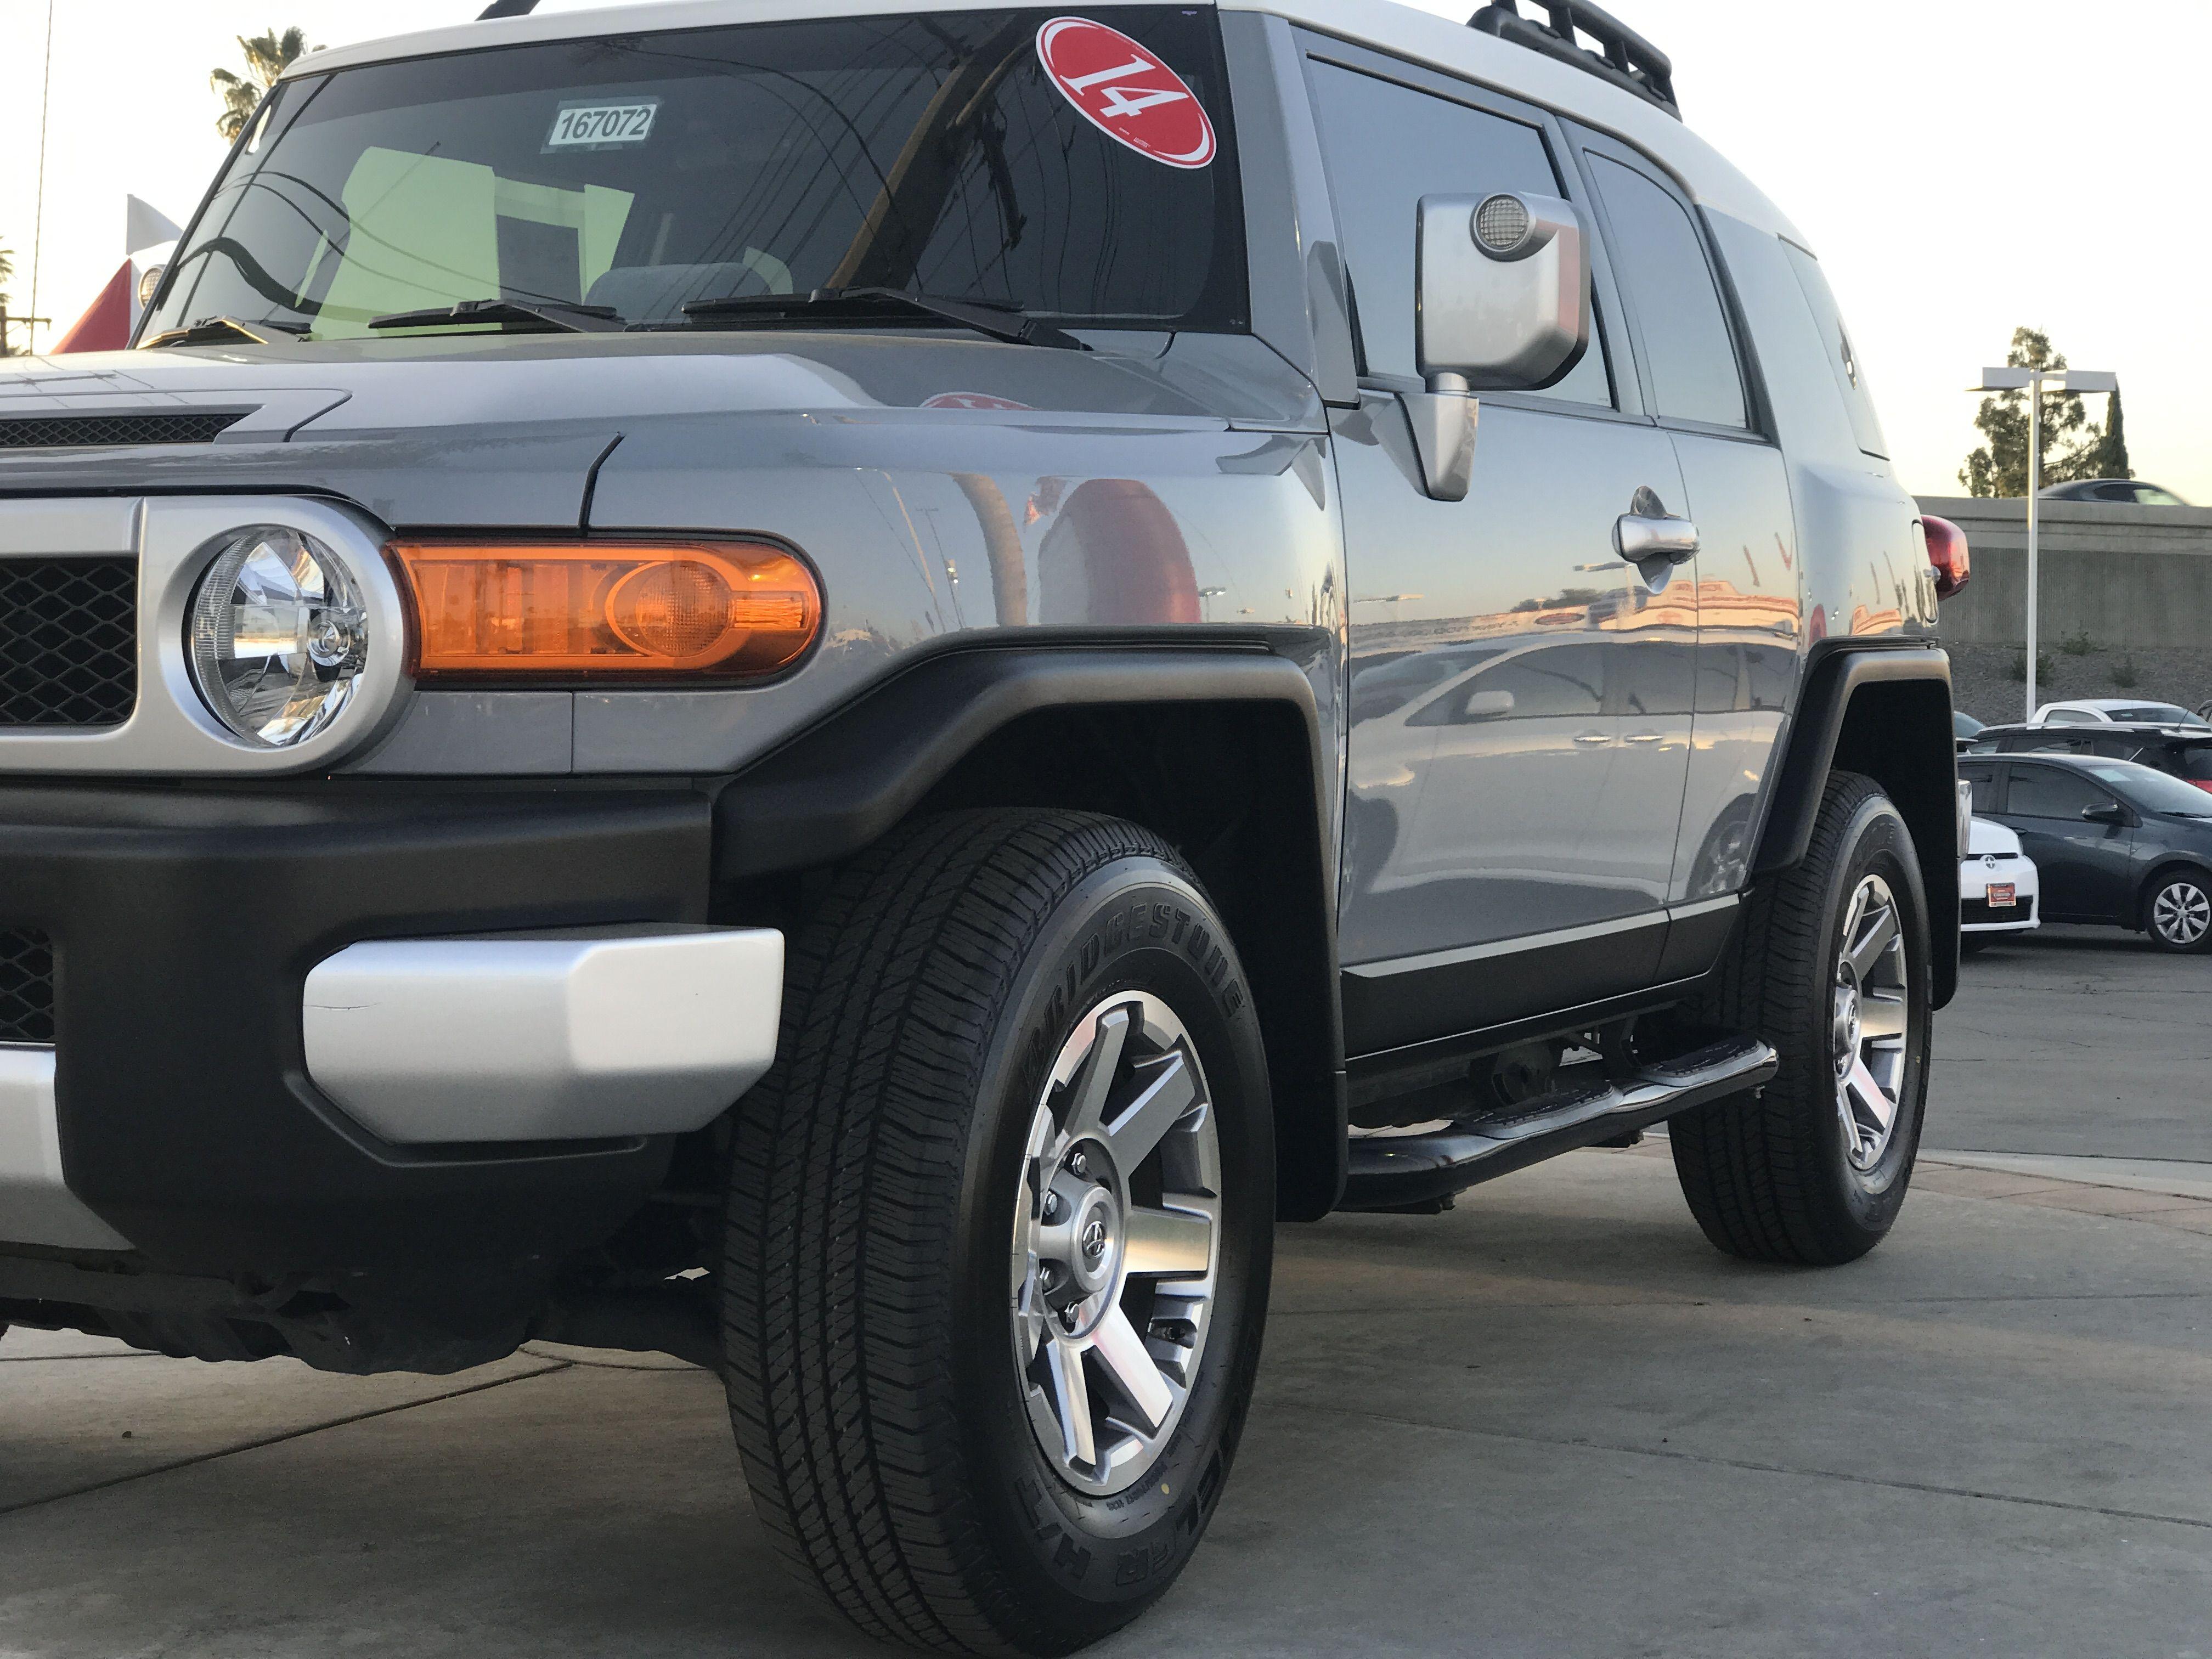 FJ Cruiser for Sale at Toyota of Riverside